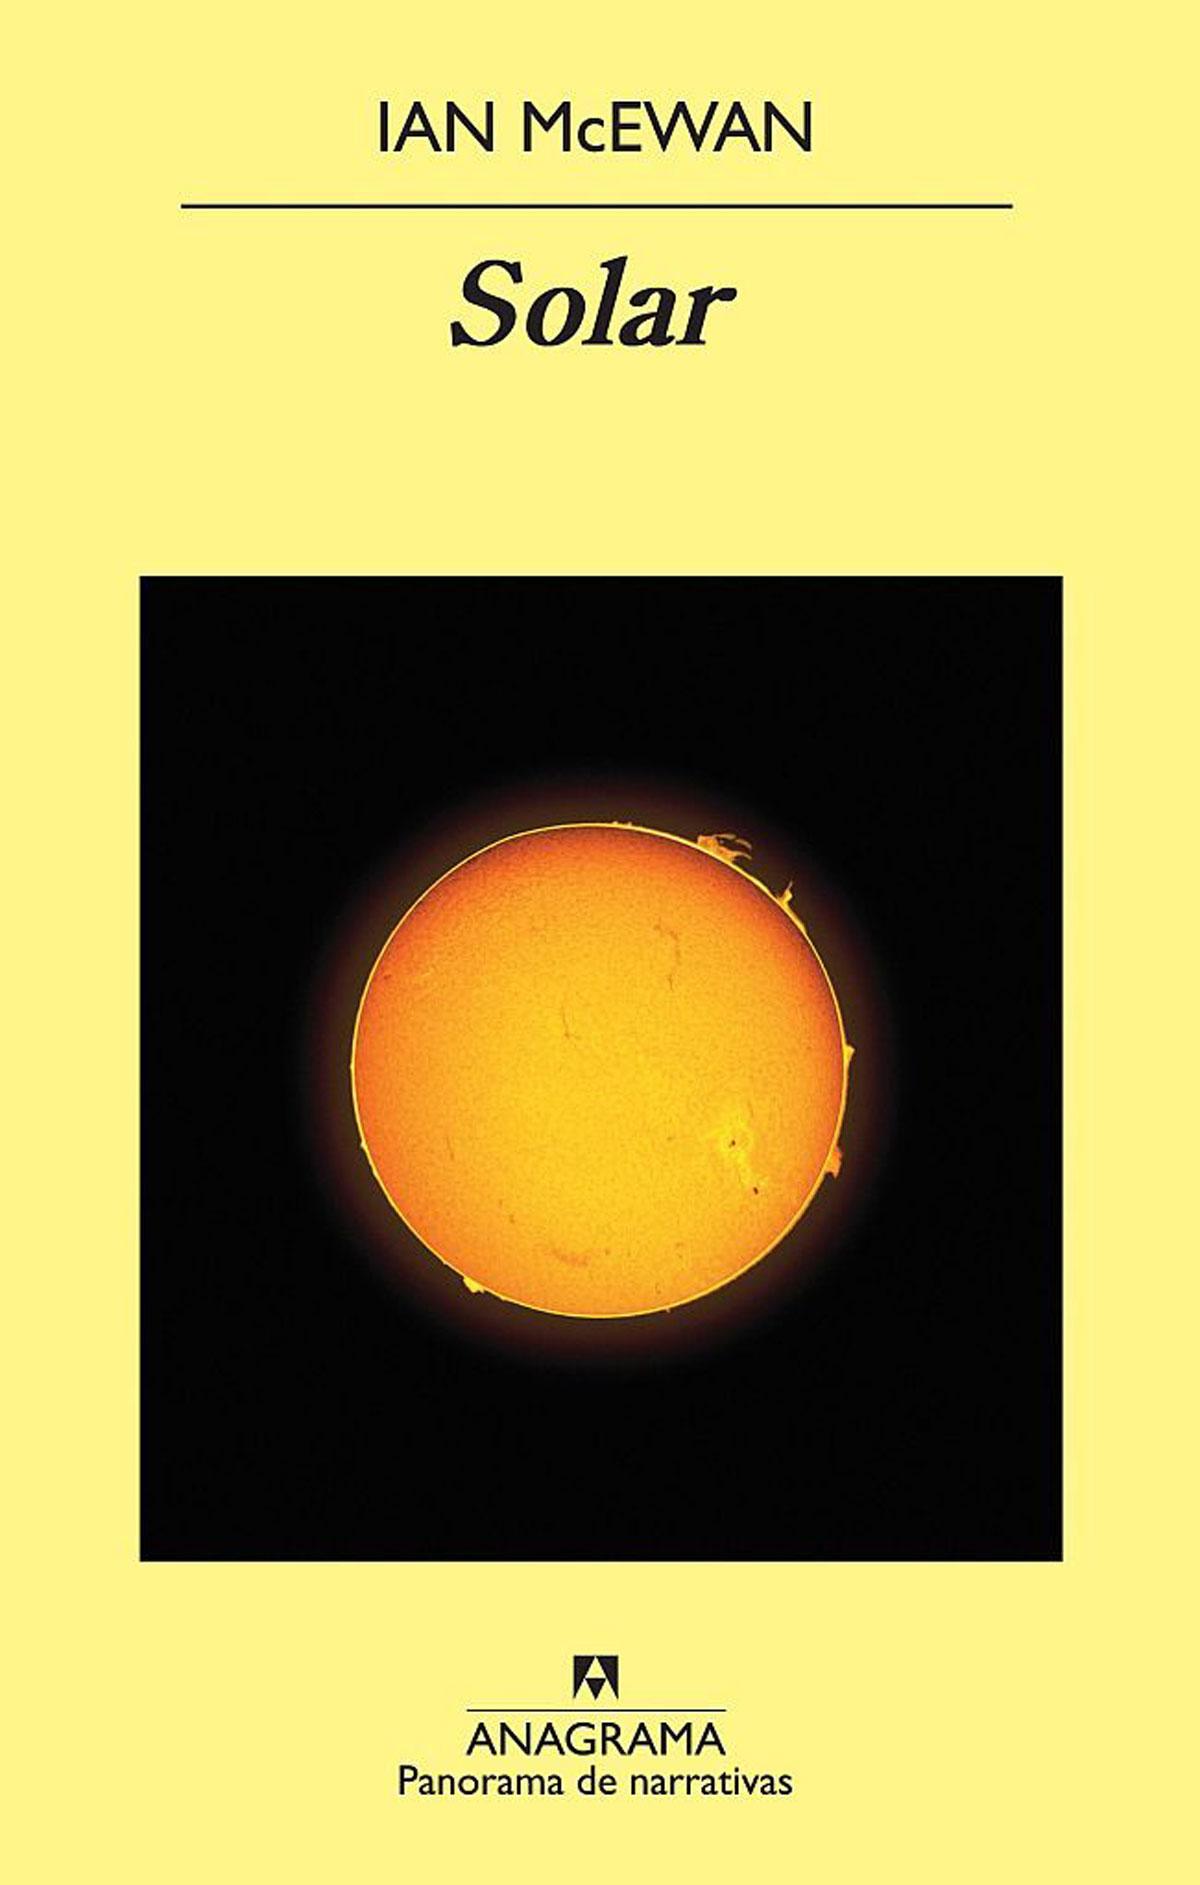 Portada de la novela Solar, de Ian McEwan